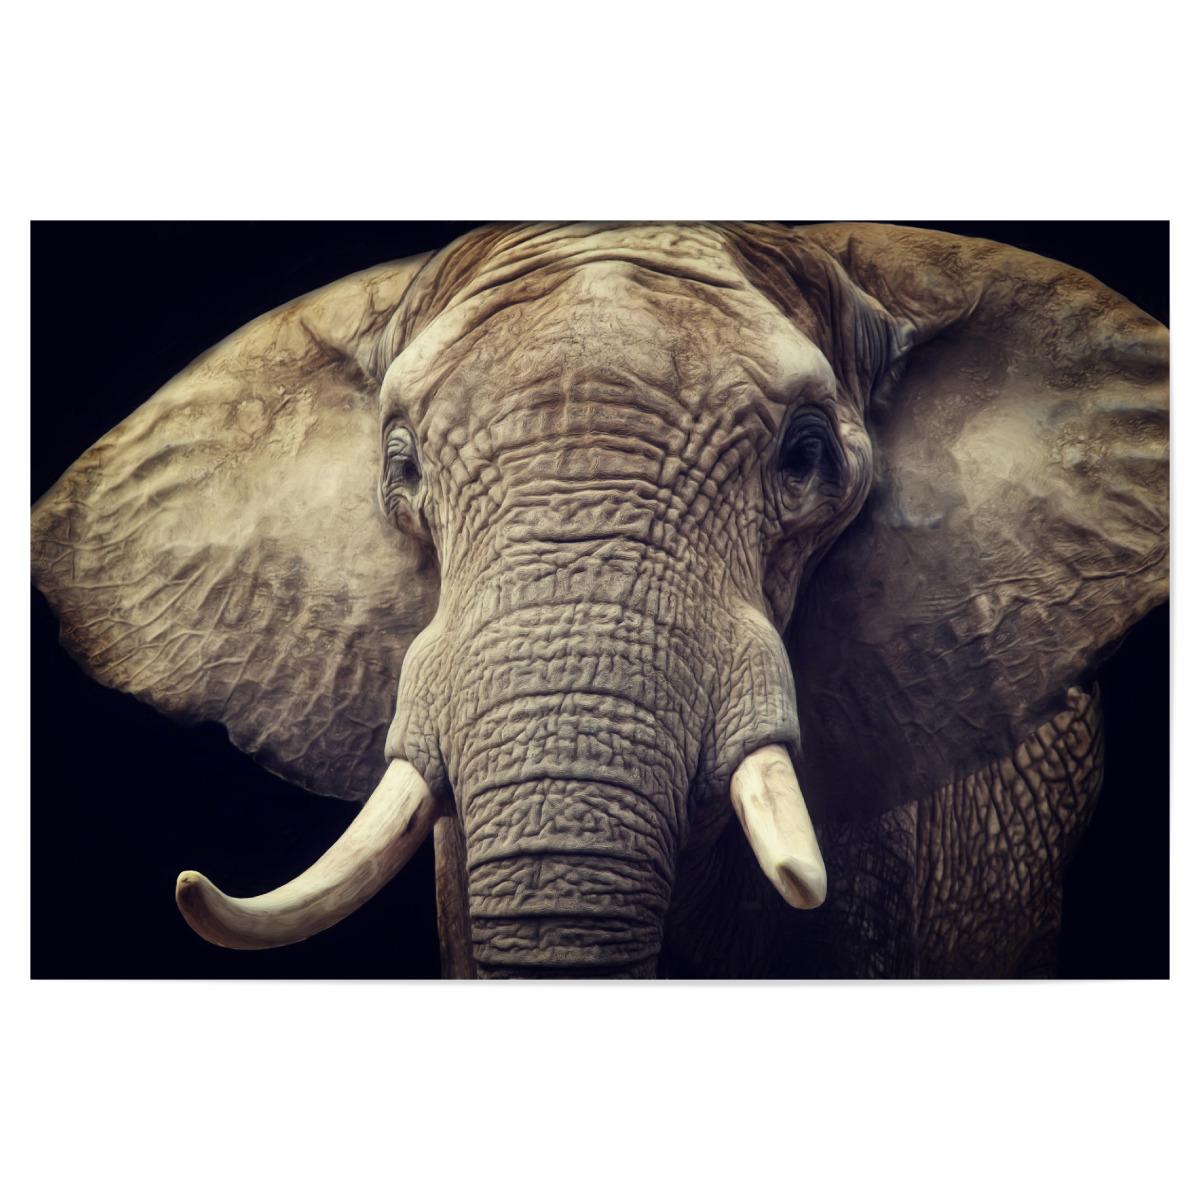 Elefanten Portrait als Poster bei artboxONE kaufen